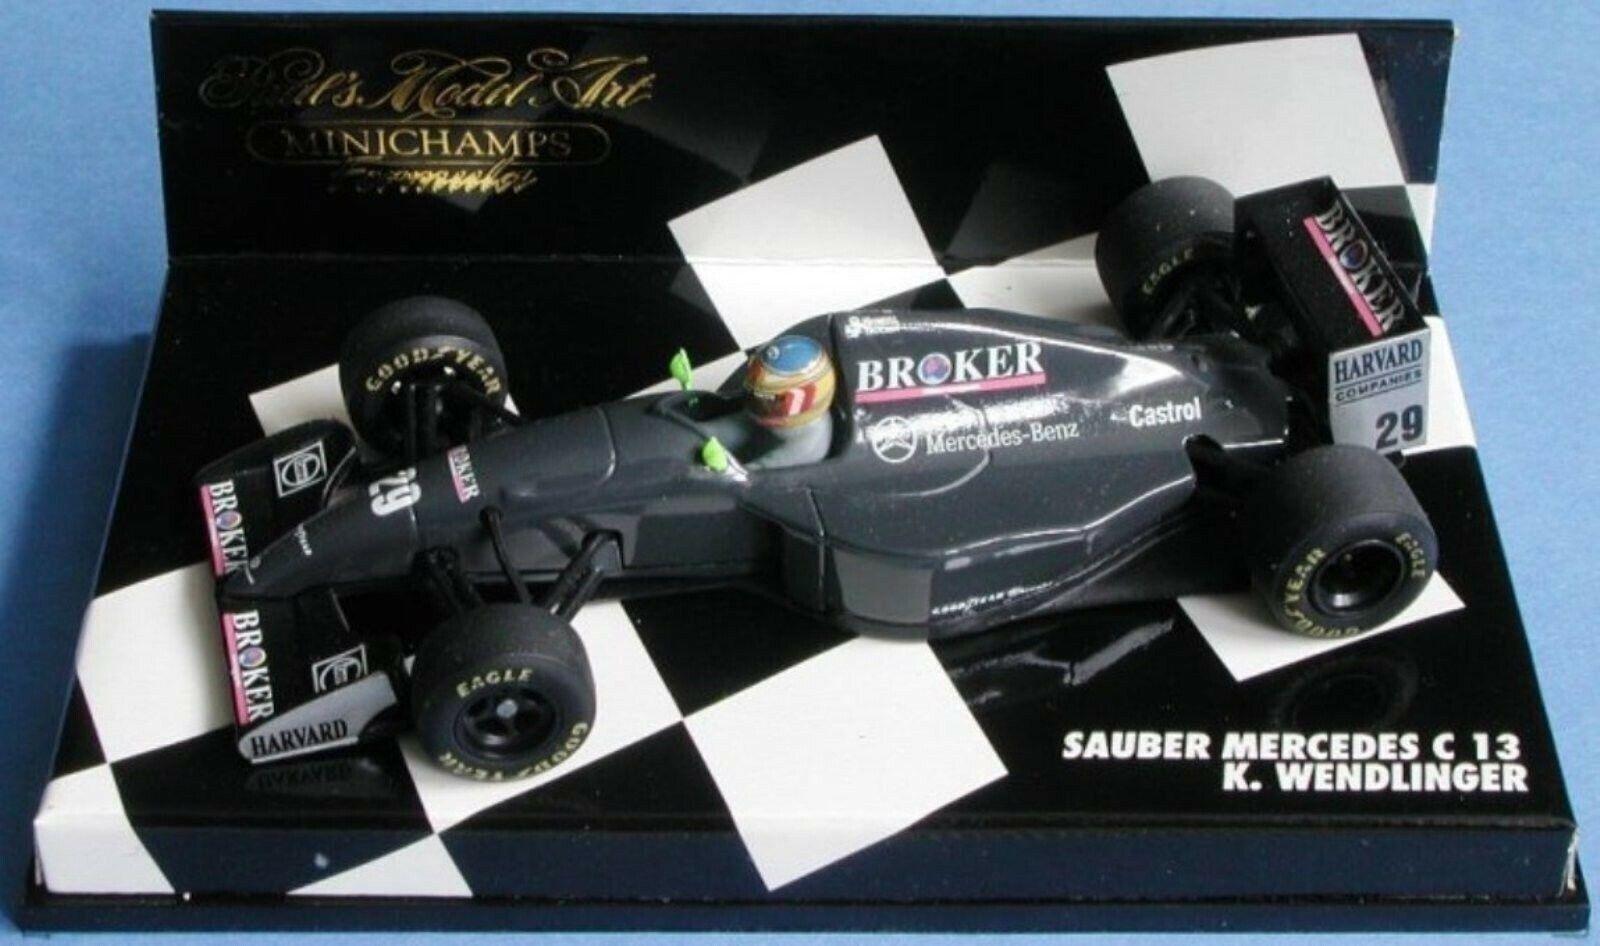 Wow extrêmement rare SAUBER C13 Mercedes Wendlinger Monza 1994 1 43 Minichamps